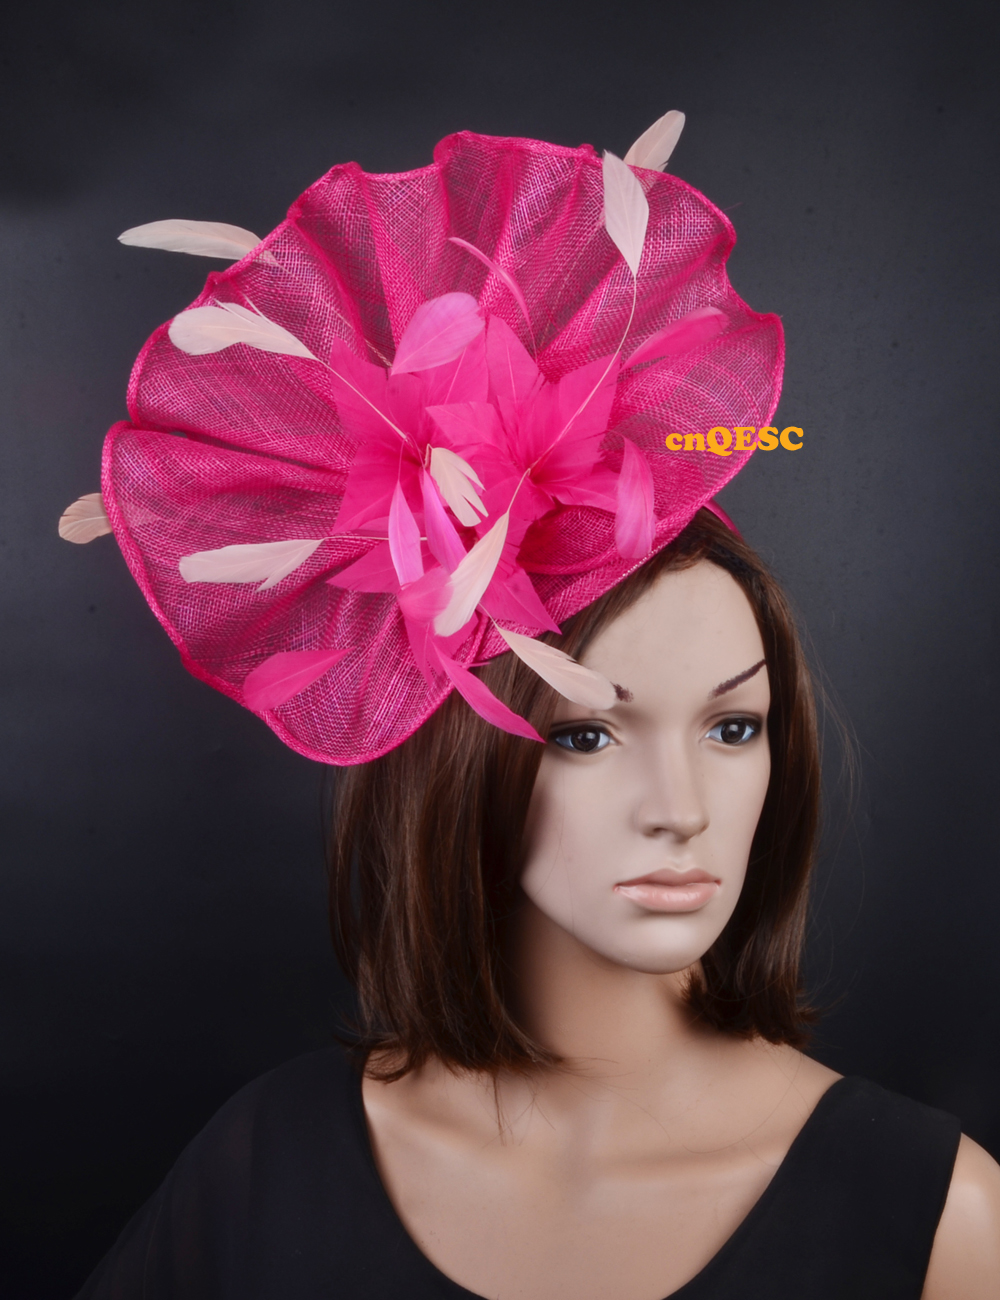 Unique design. hot pink Large feather fascinator sinamay fascinator formal  hat kentucky derby hat wedding hat. e4d9ef77238